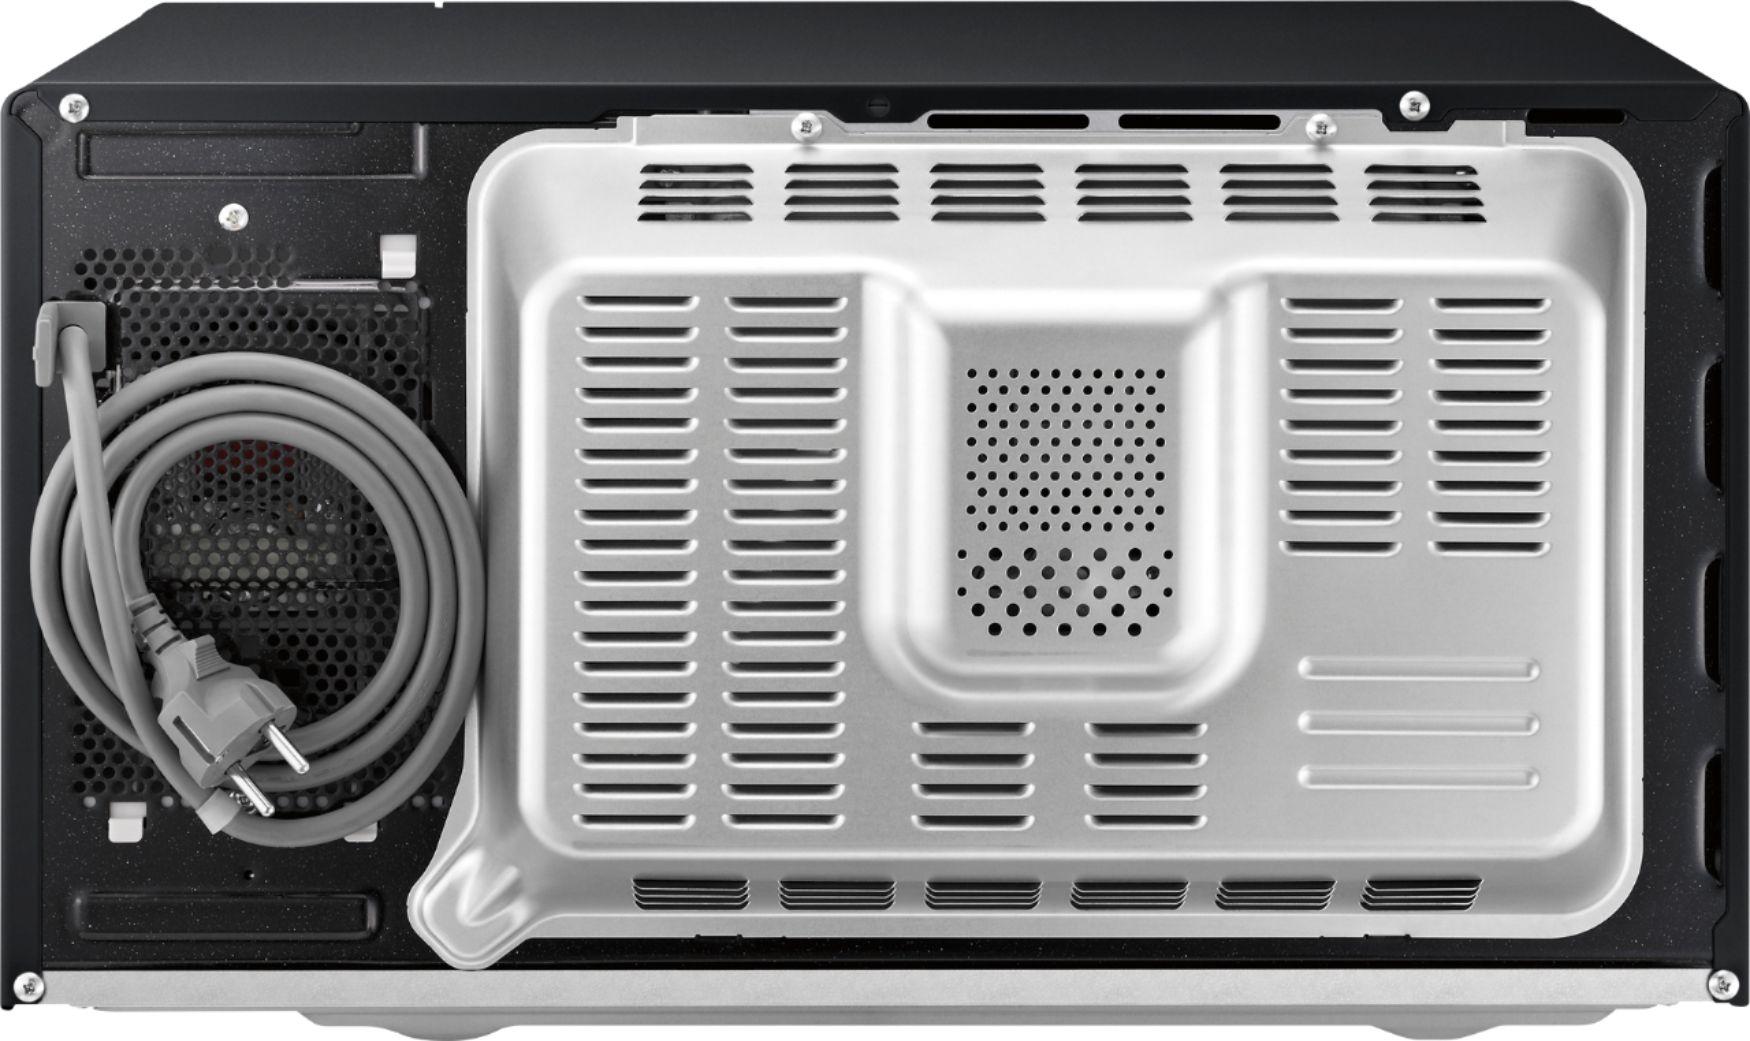 Samsung M308 Junior Microwave